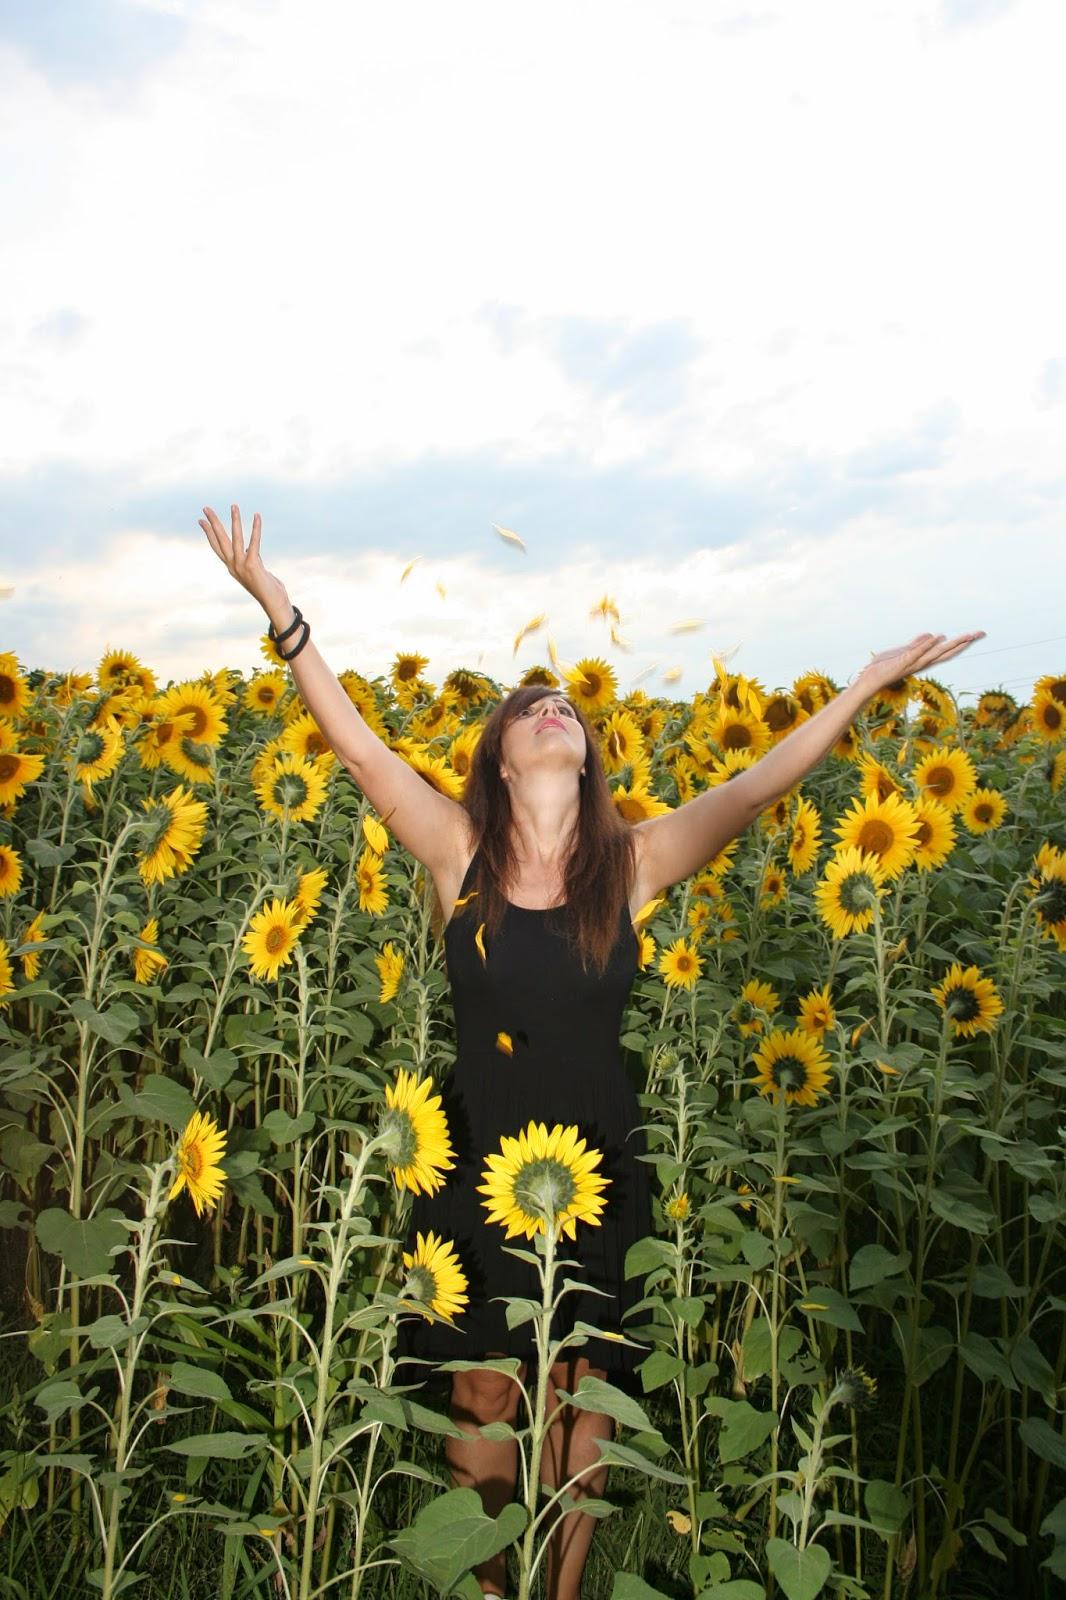 Campo de girasoles en Asturias. Sunflowers field in Asturias, Spain